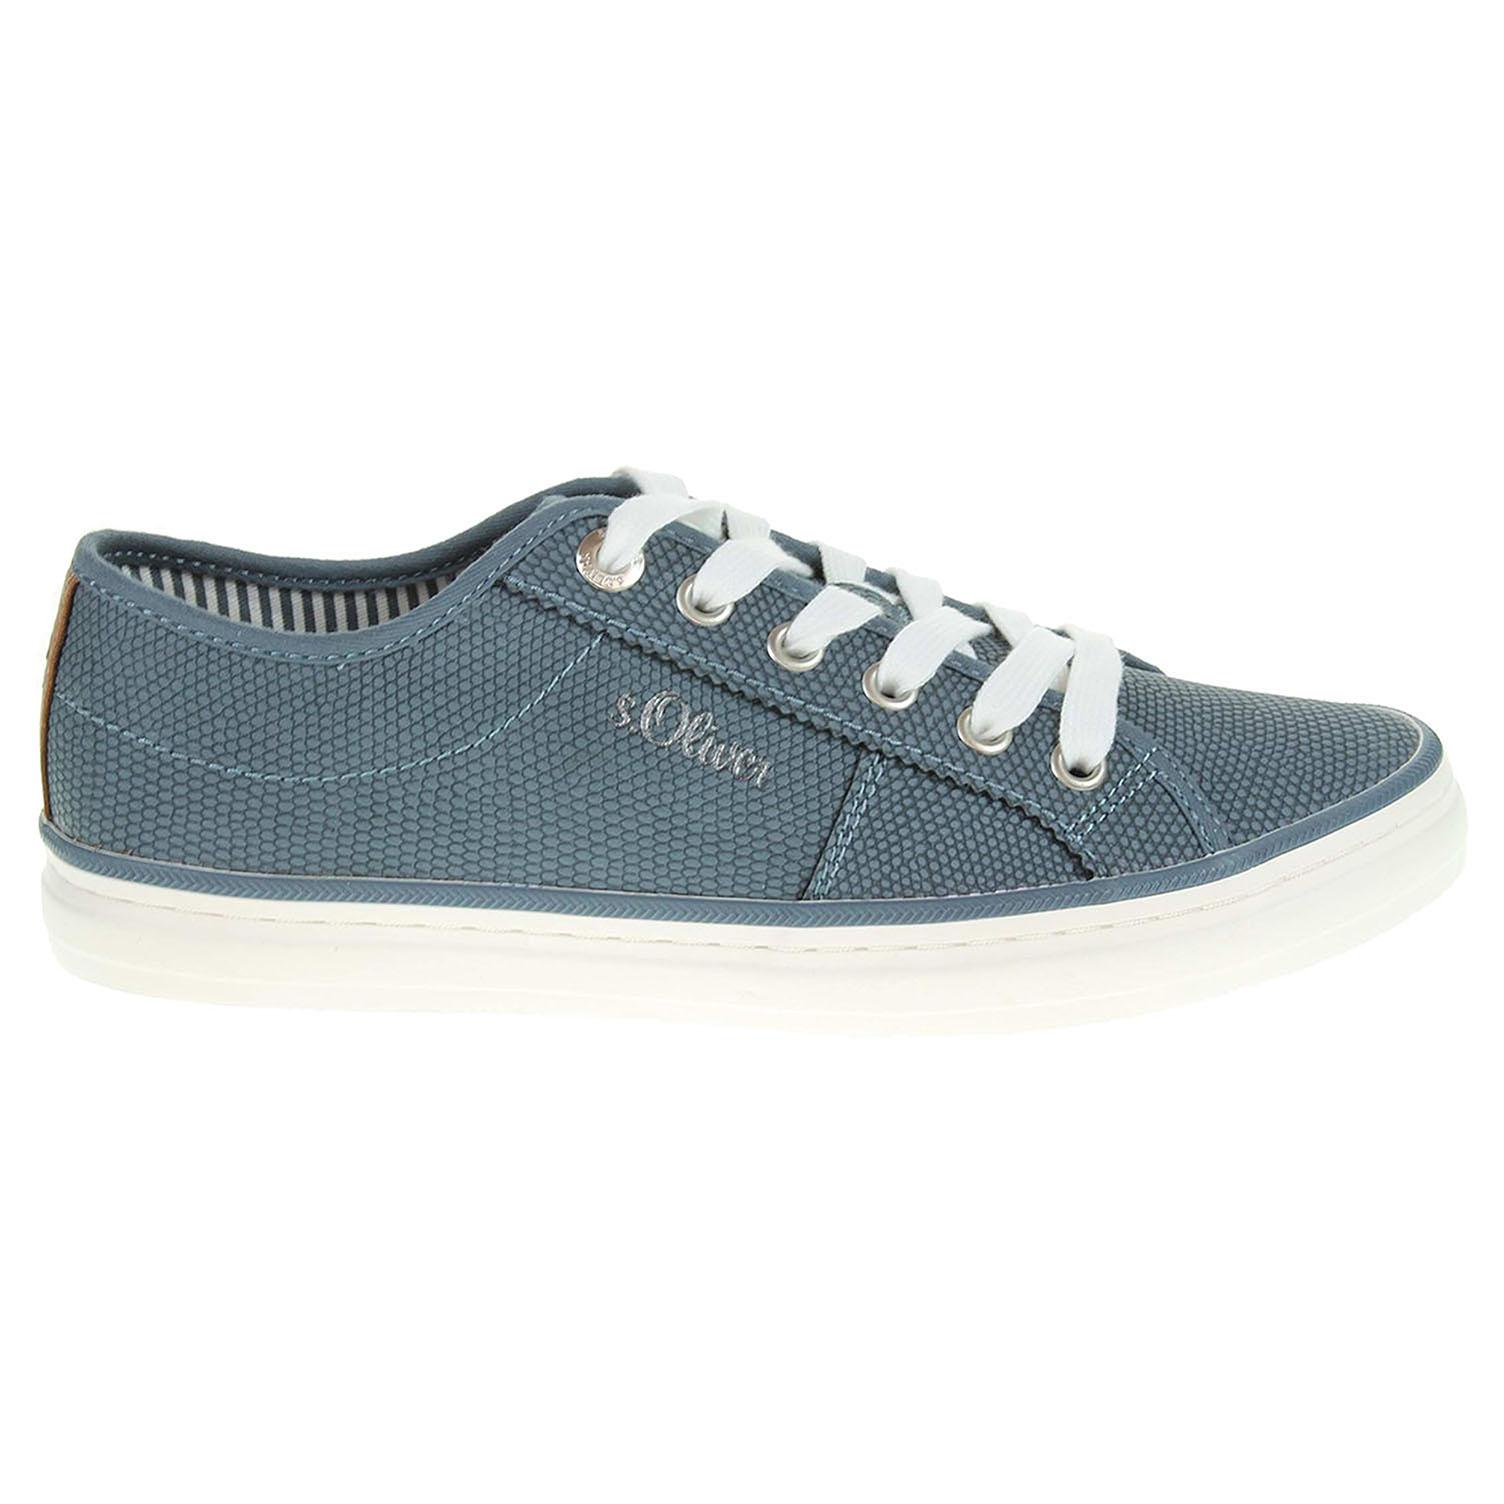 s.Oliver dámská obuv 5-23640-28 modrá 36 modrá modrá